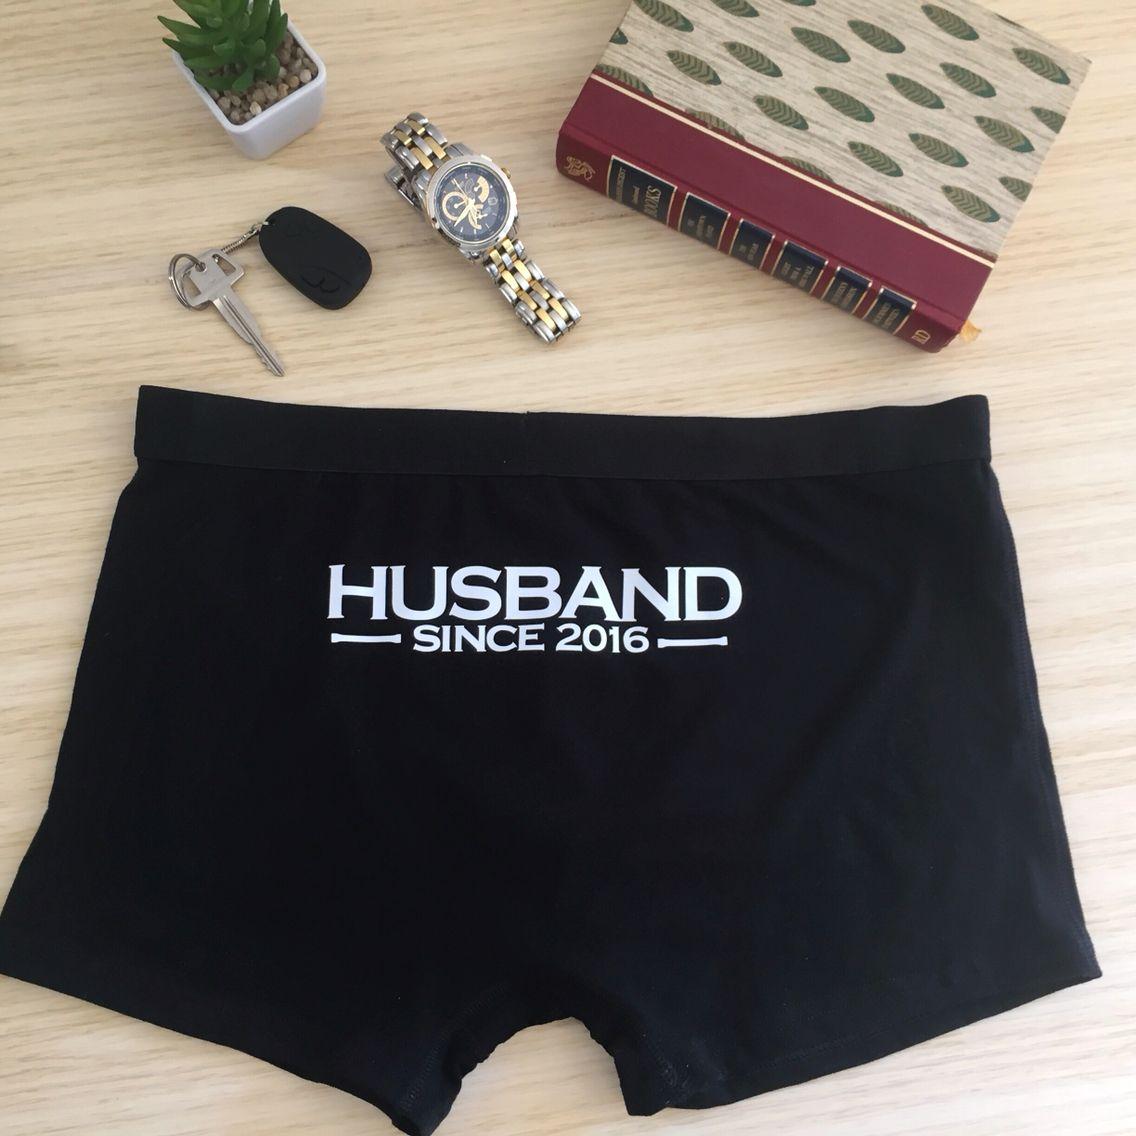 Great Wedding Gift For Husband: Personalised Underwear; Underwear For Groom; Husband